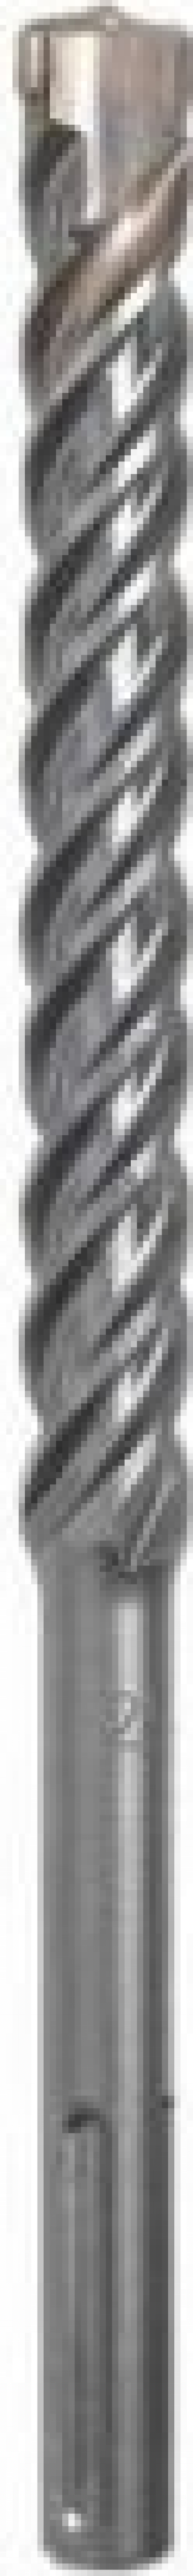 Burghiu SDS-max EXTREME 4 taisuri 28 x 550 x 670 mm Dewalt Accesorii masini de gaurit